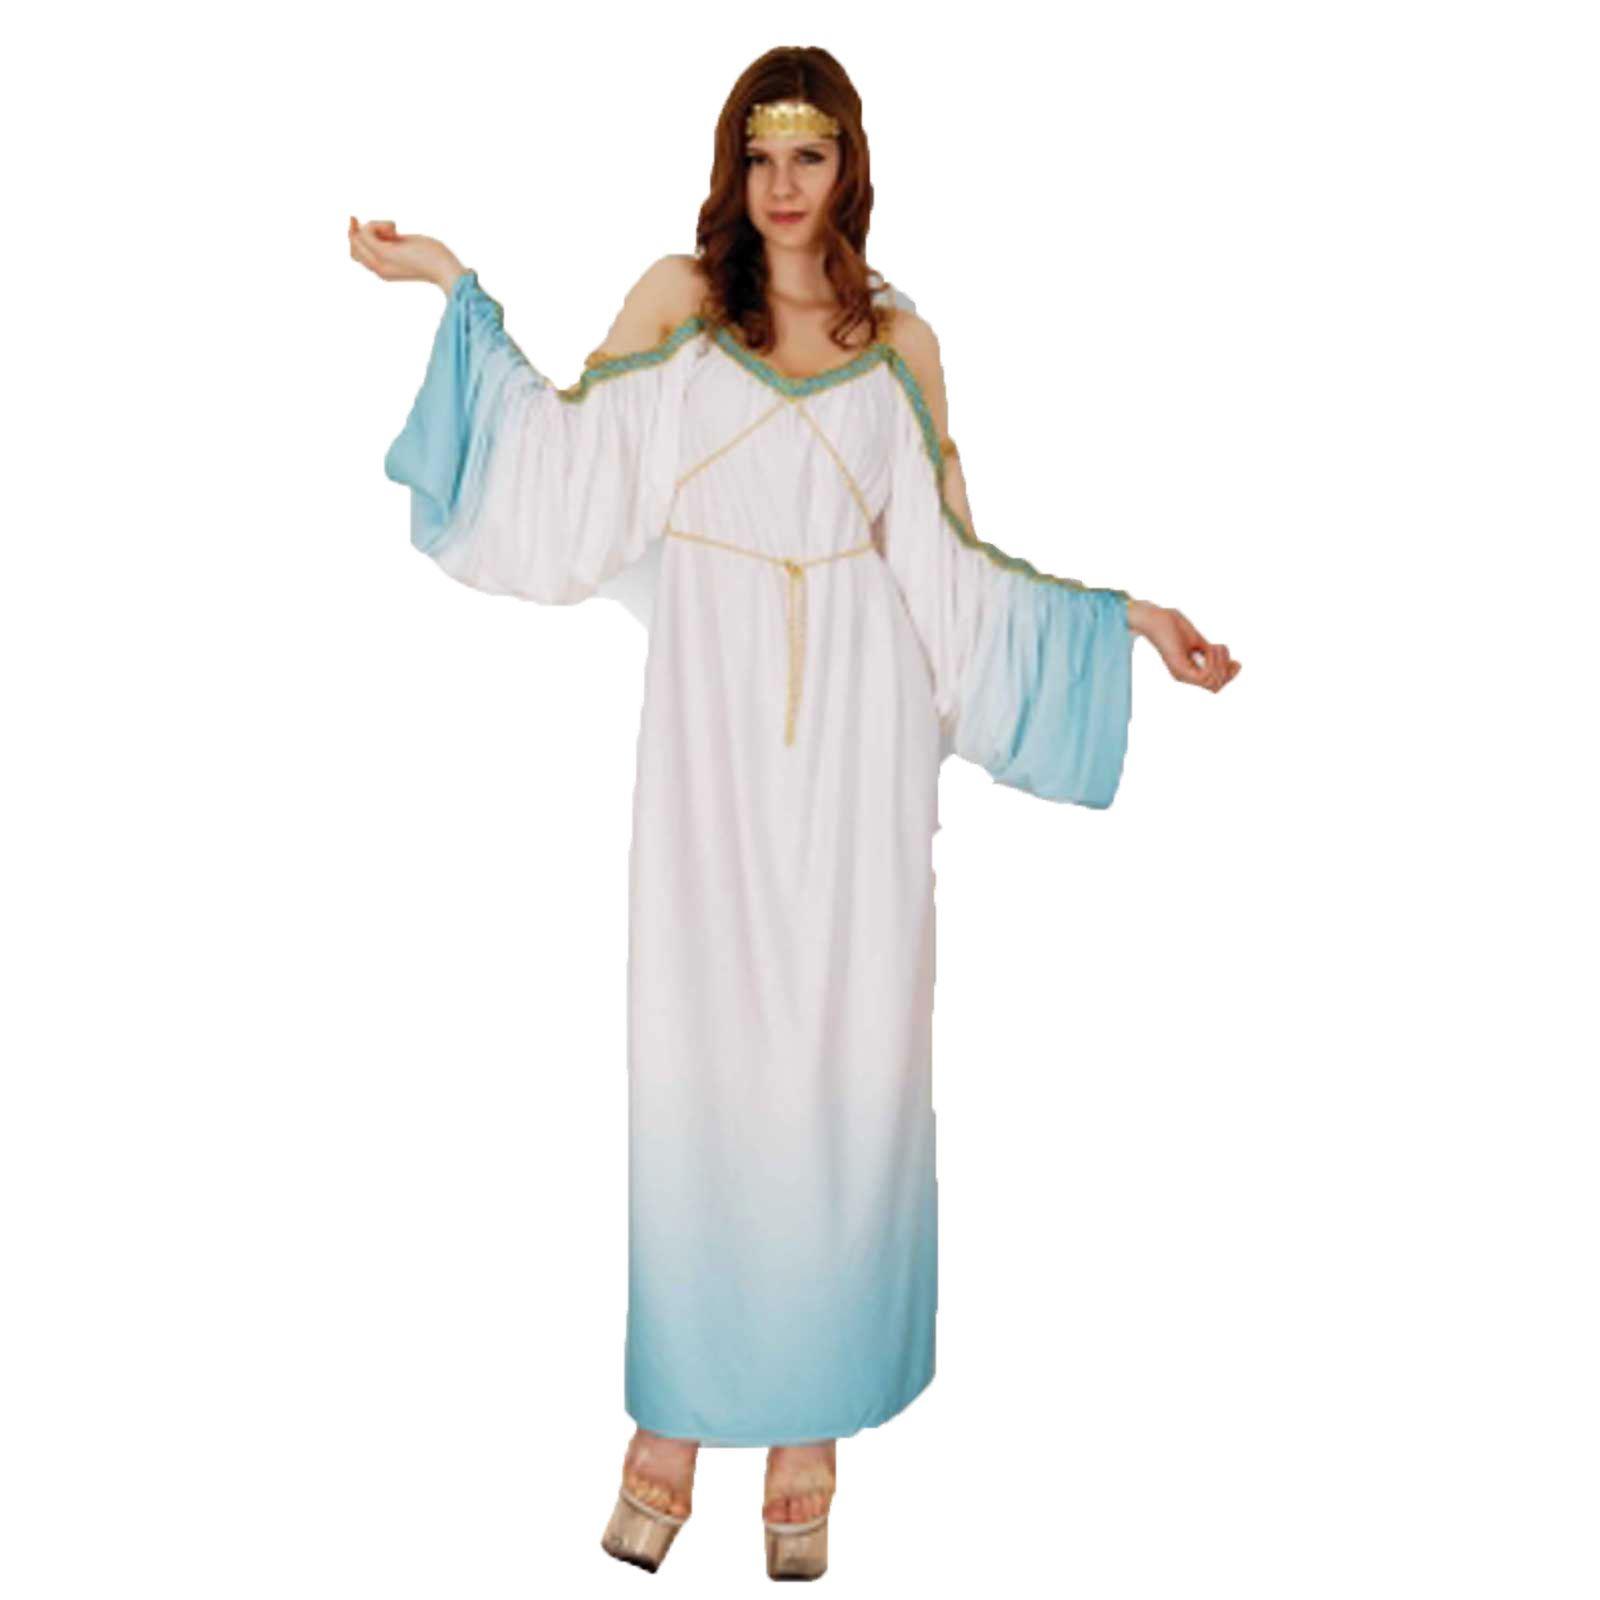 New-Womens-Christmas-Goddess-Greek-Roman-Costumes-Adults-  sc 1 st  eBay & New Womens Christmas Goddess Greek Roman Costumes Adults Xmas Fancy ...